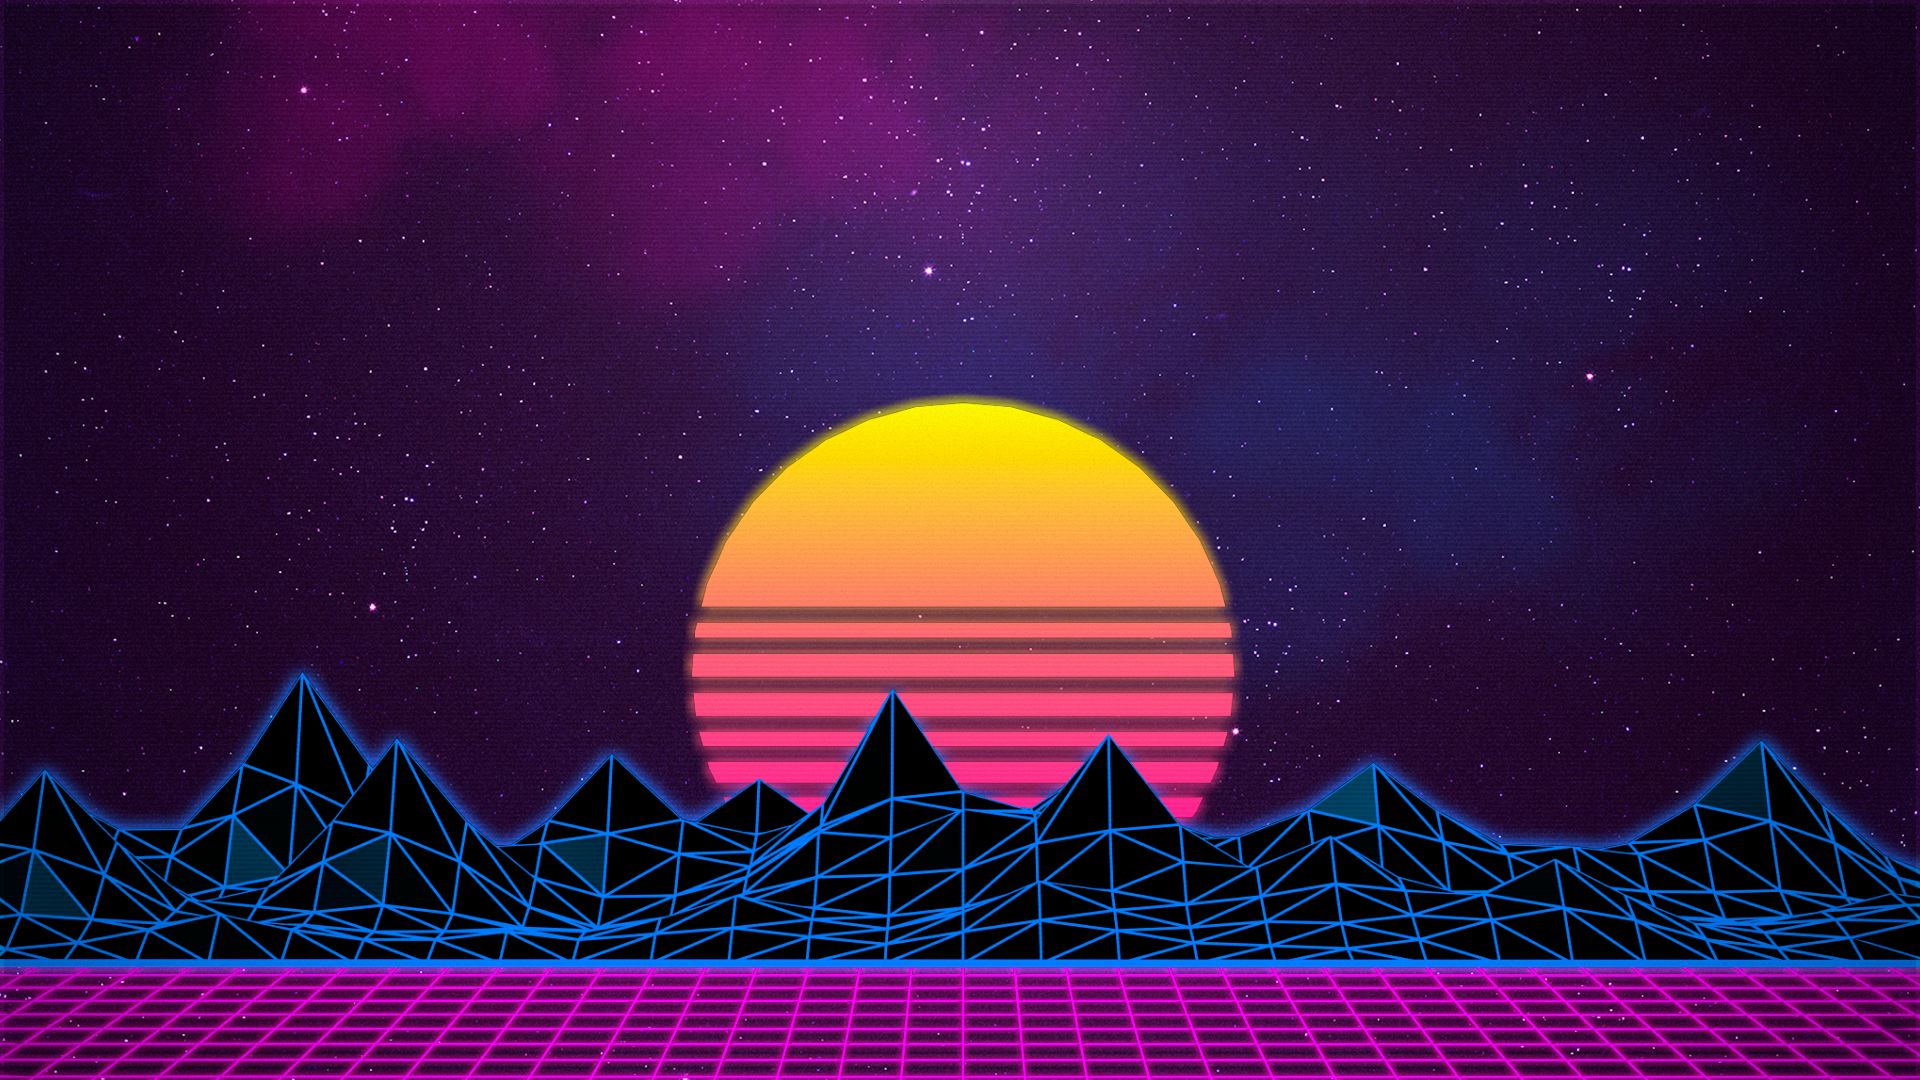 Retrowave Vaporwave Wallpaper Retro Wallpaper Retro Waves